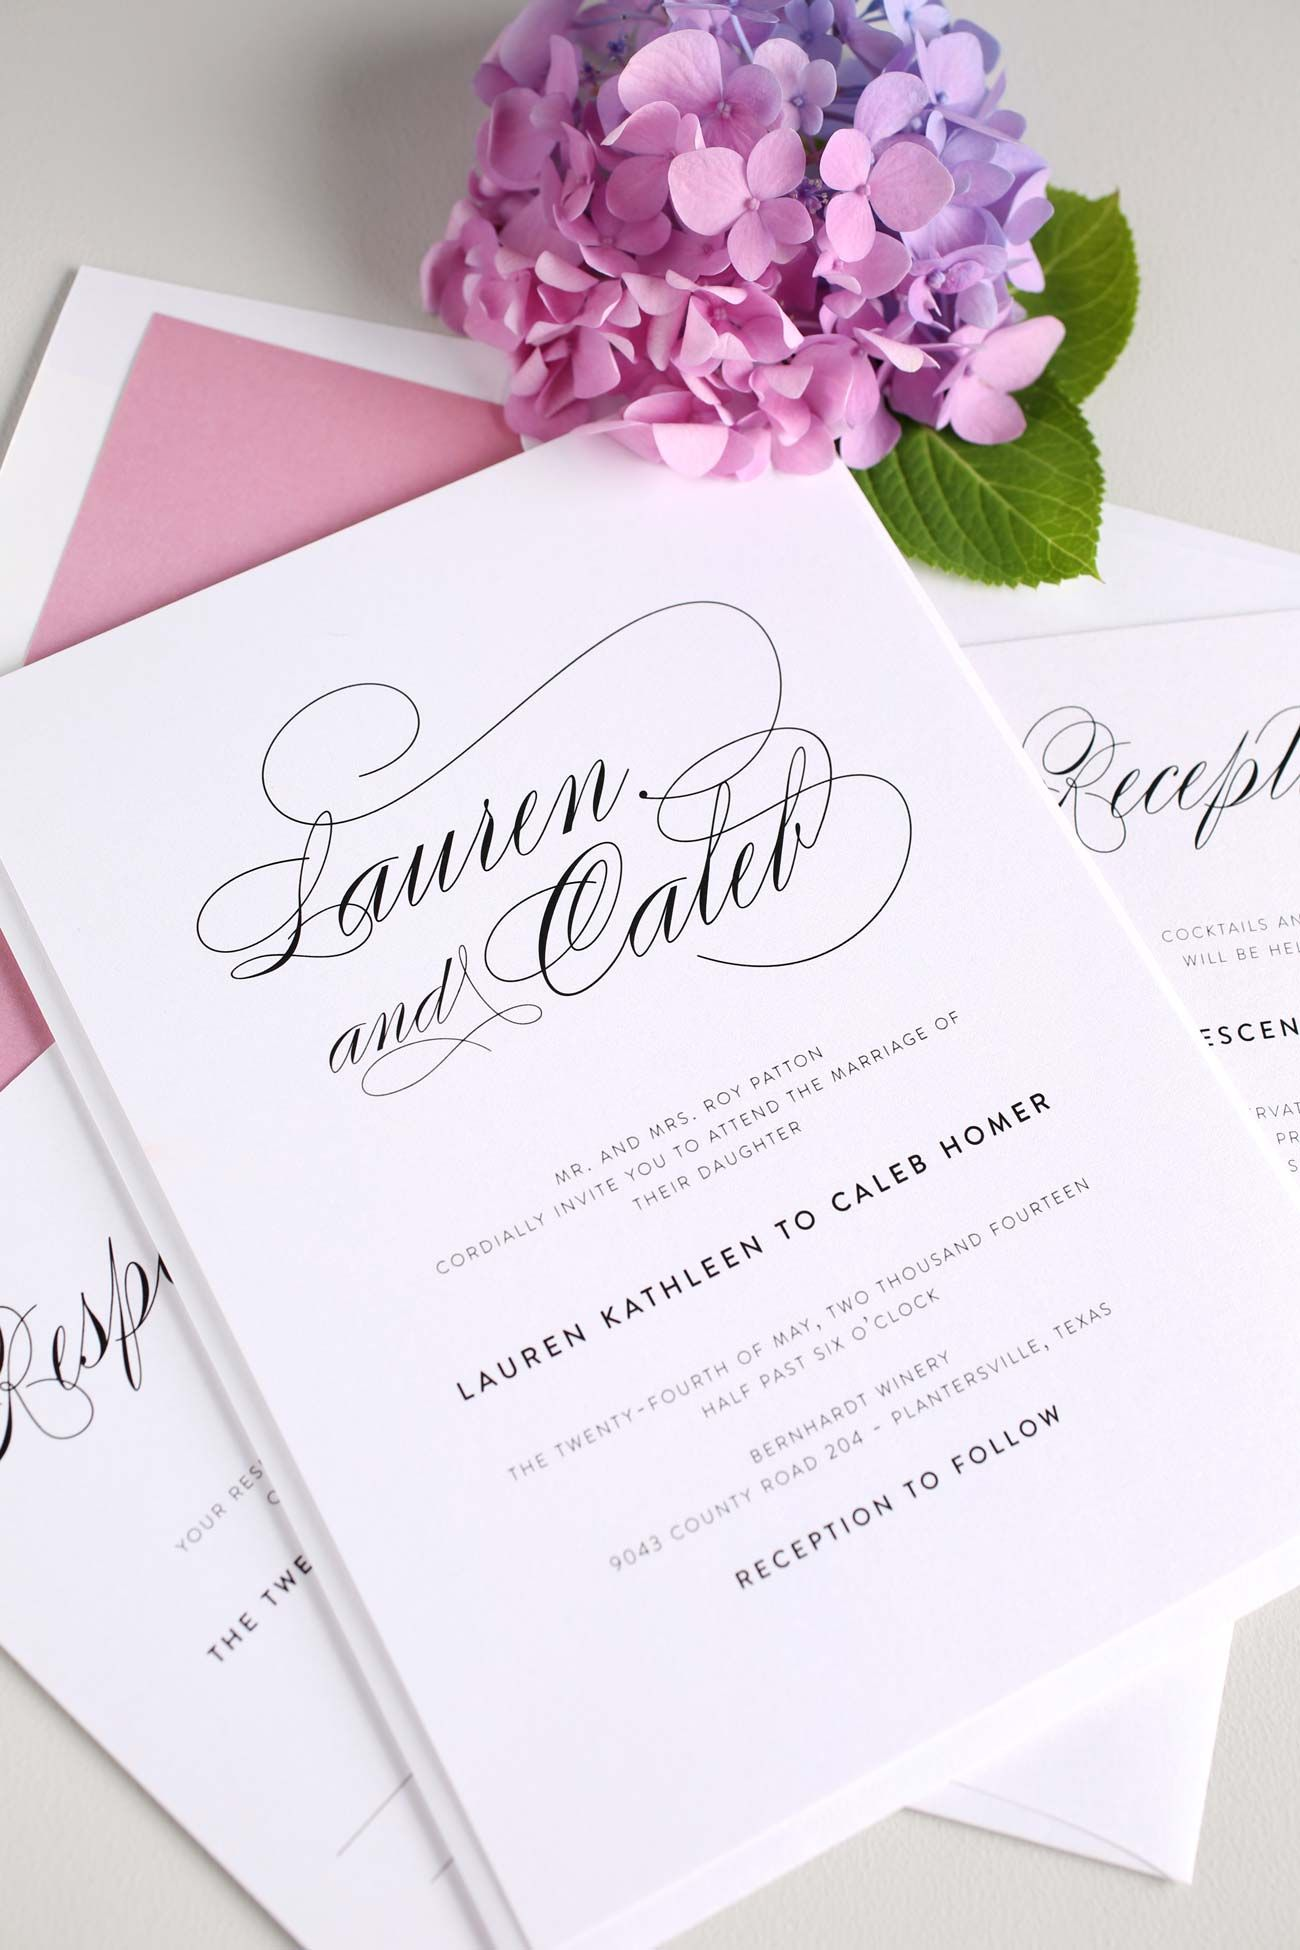 Script Elegance Wedding Invitations in Rose | Fonts, Envelope liners ...